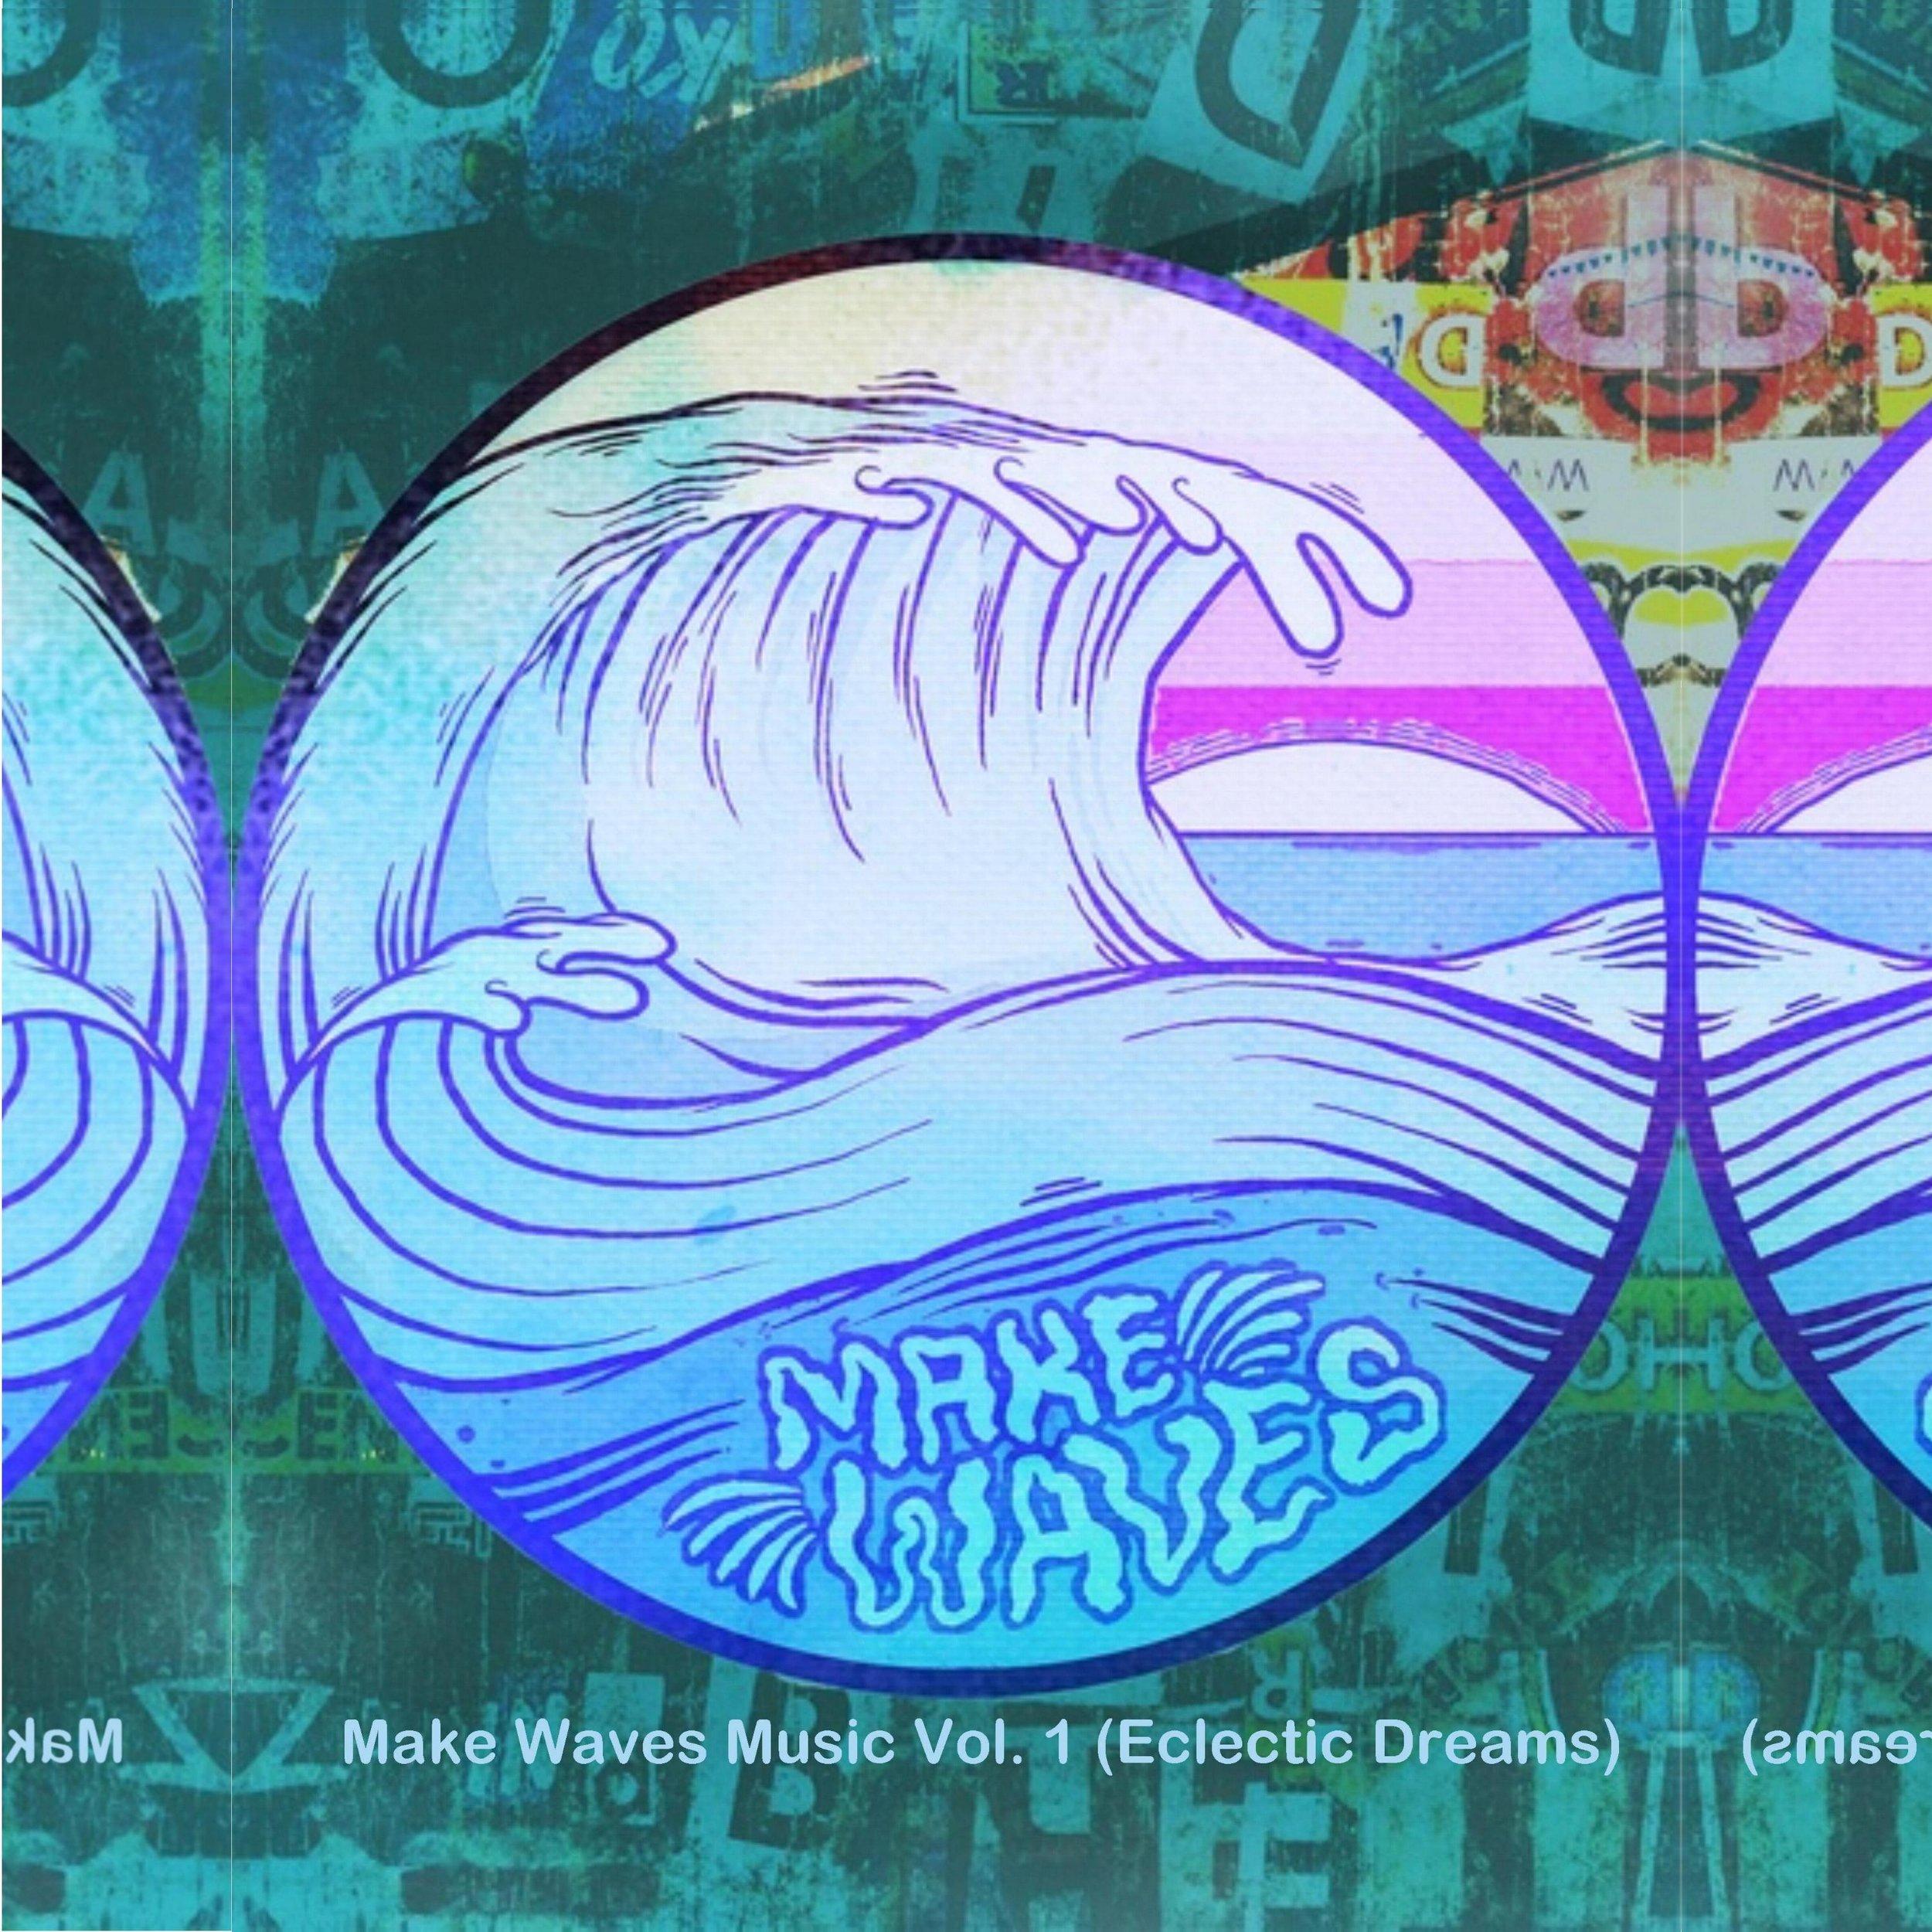 MakeWavesMusicCoverArt3LG.jpg